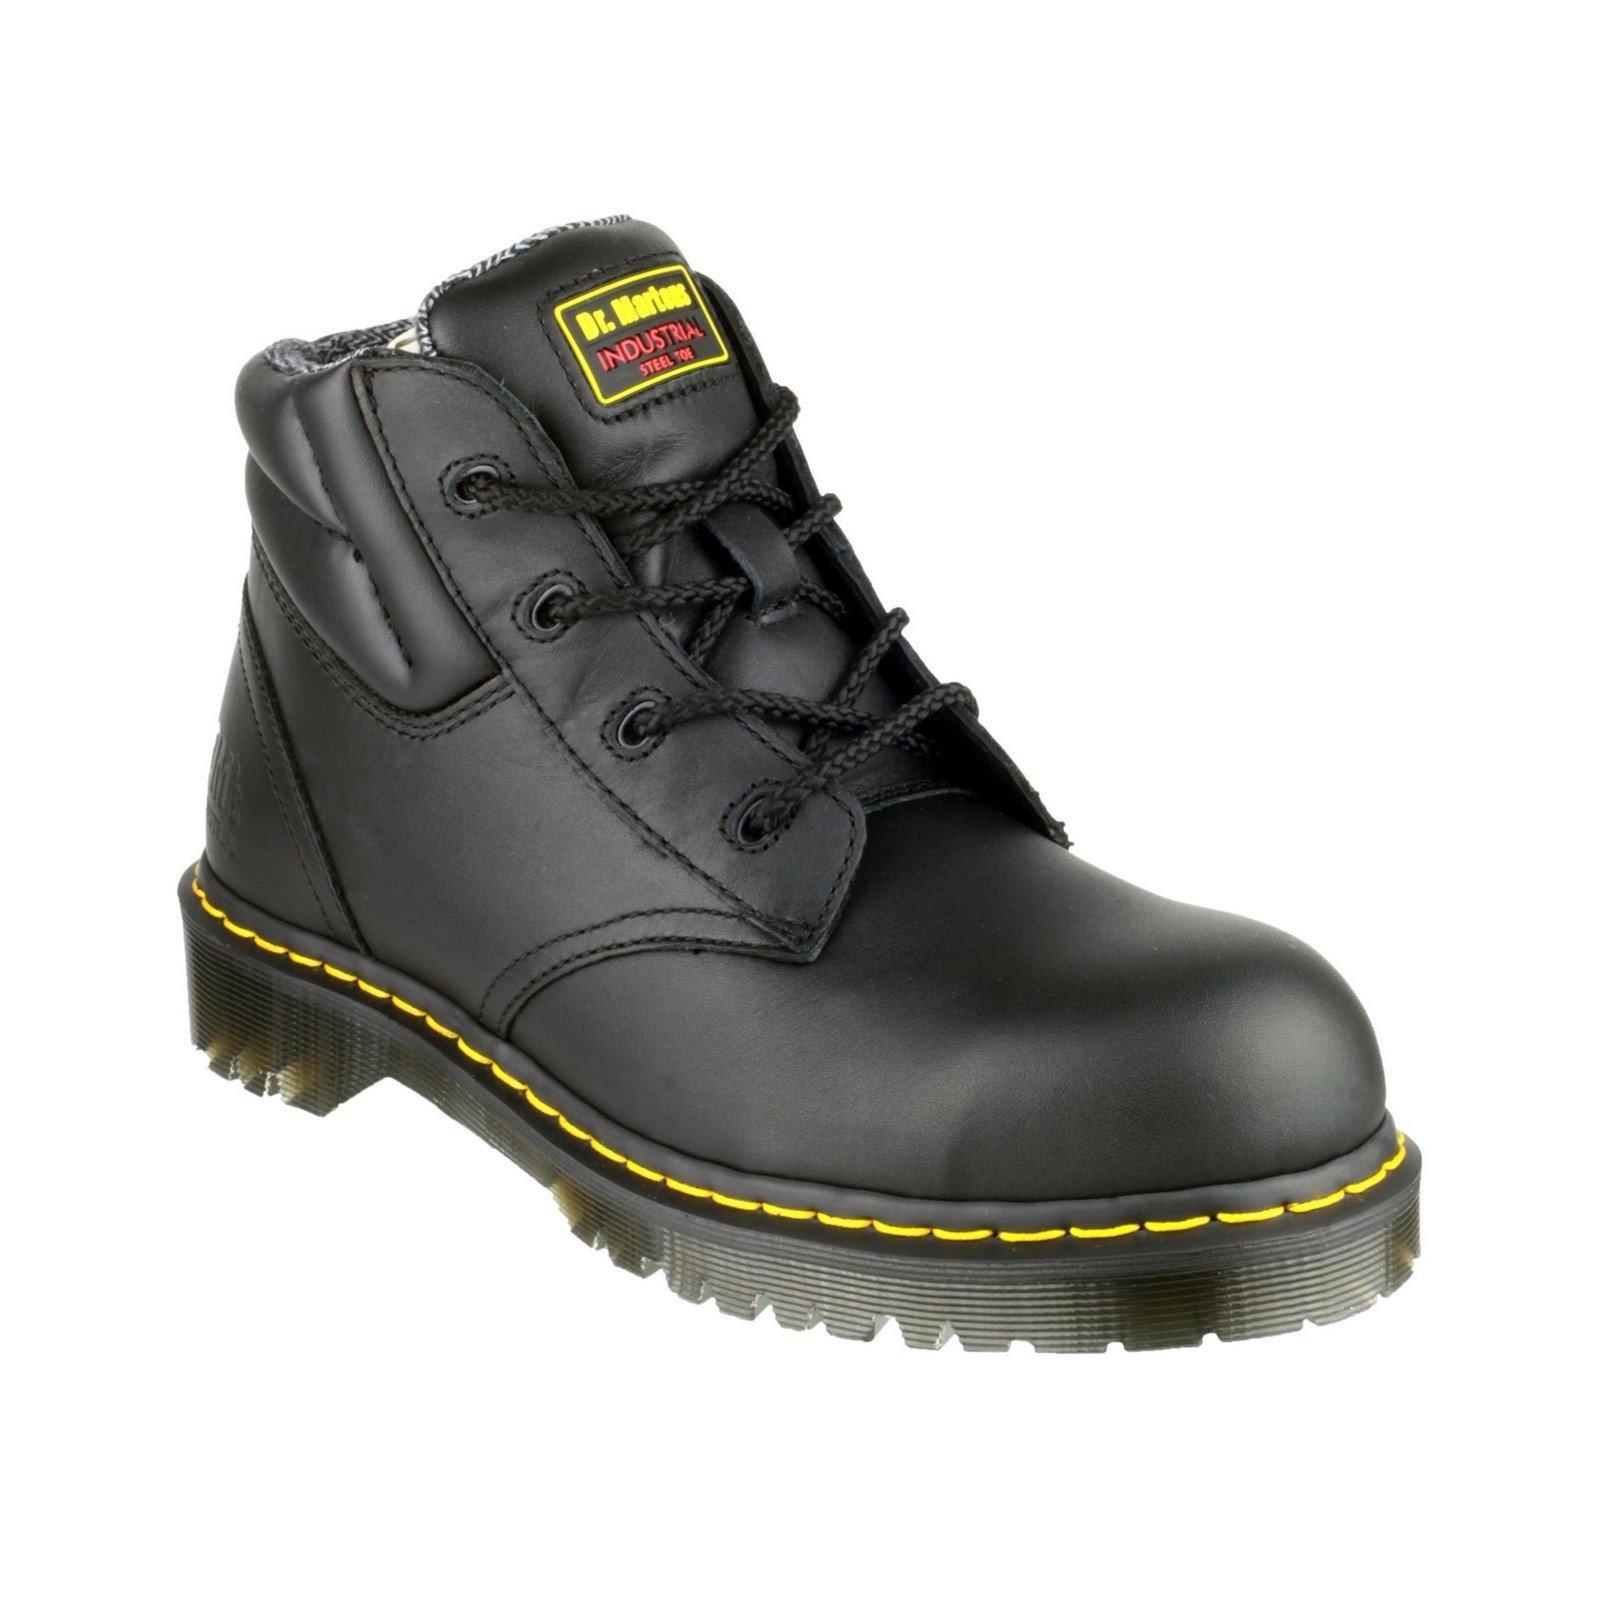 Dr Martens Unisex Lace-Up Boot Black 14068 - Black 6